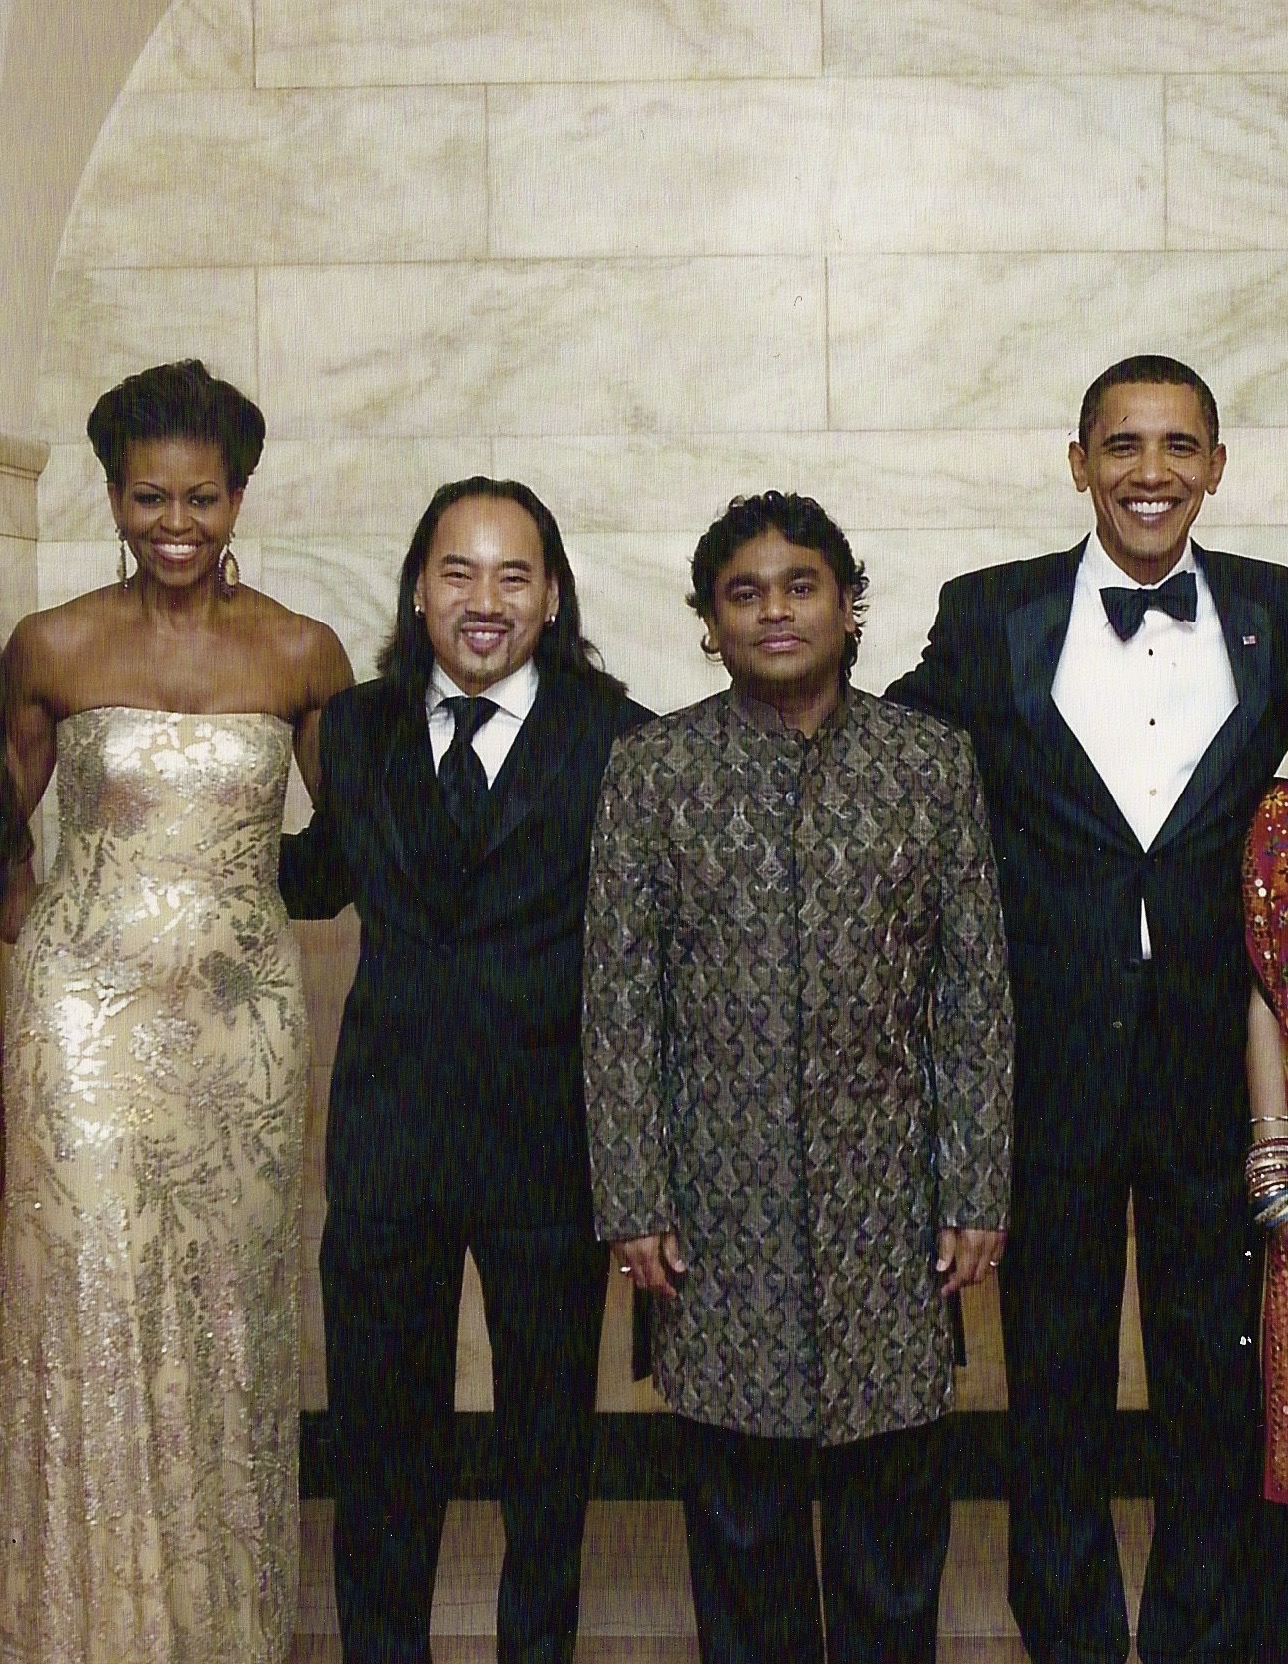 A.R. Rahman, President Barack Obama, First Lady Michelle Obama